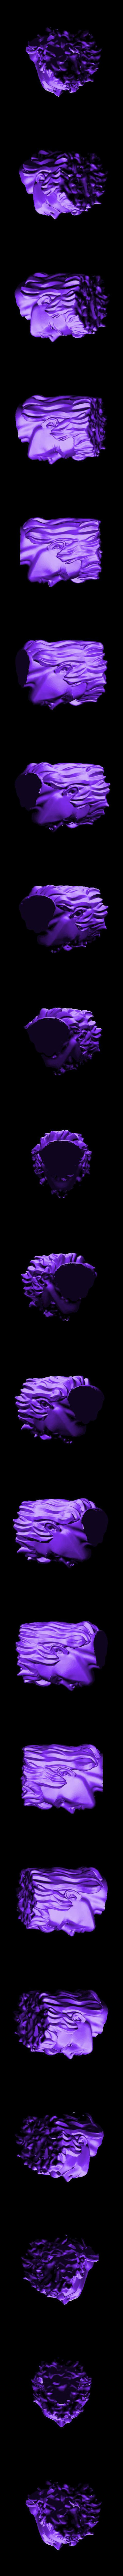 Captain_Planet_Head.stl Download free STL file Captain Planet • 3D printable design, mag-net